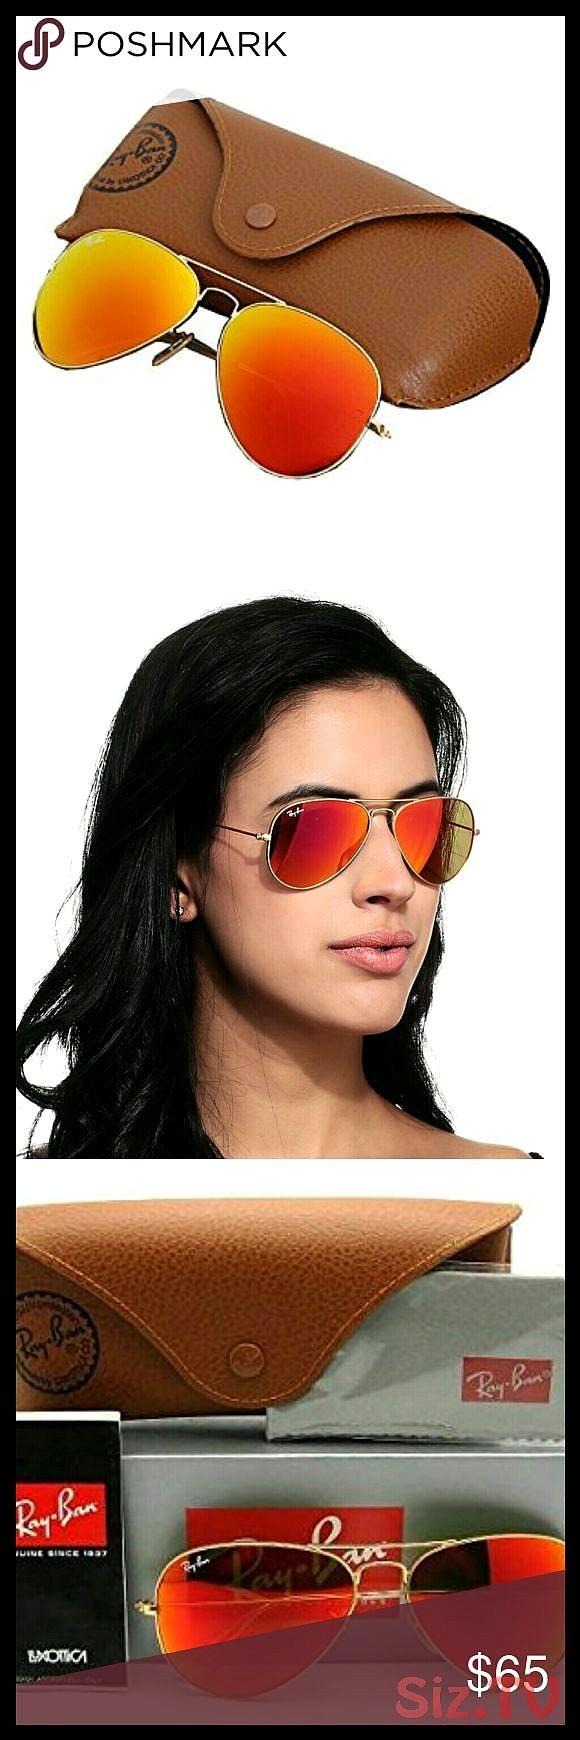 RayBan Aviator Sungkasses Gold Orange Flash Lens Iconic RayBan Aviator Sunglasses with gold mat frame and flash orange mirror lenses beach or city RayBan Aviator Sungkass...